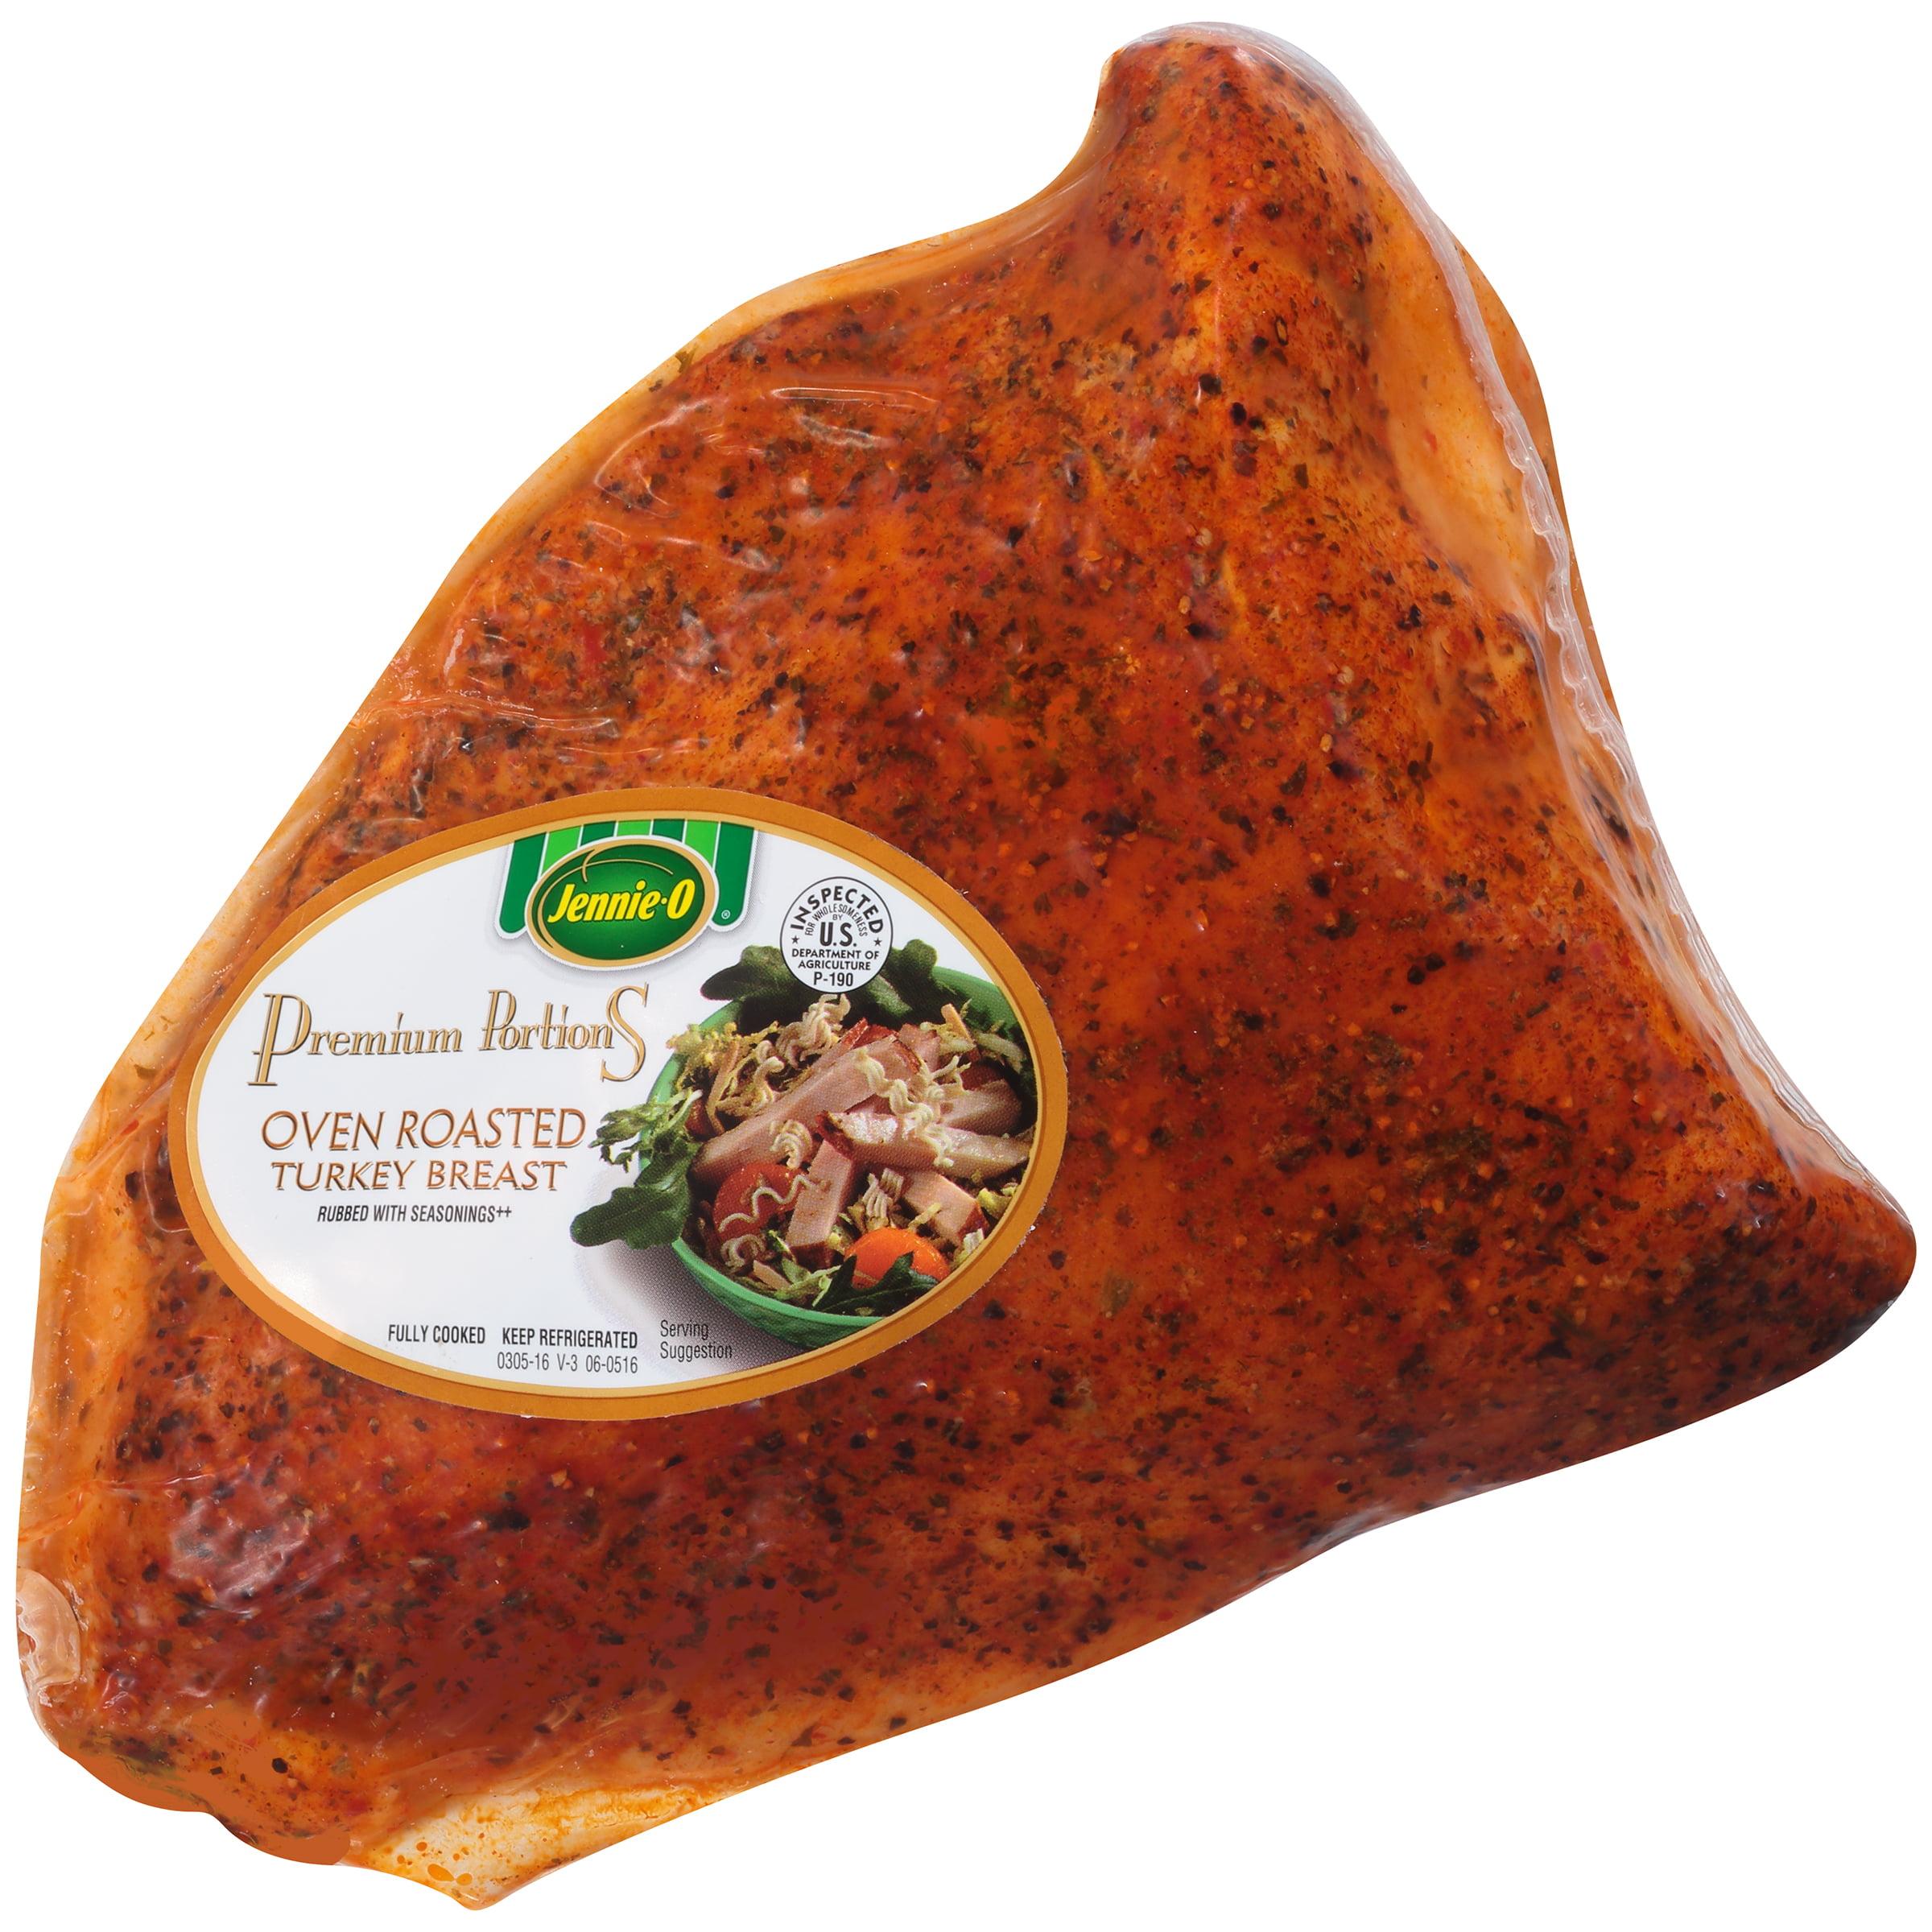 Jennie-O Roasted Turkey Breast, Deli Sliced